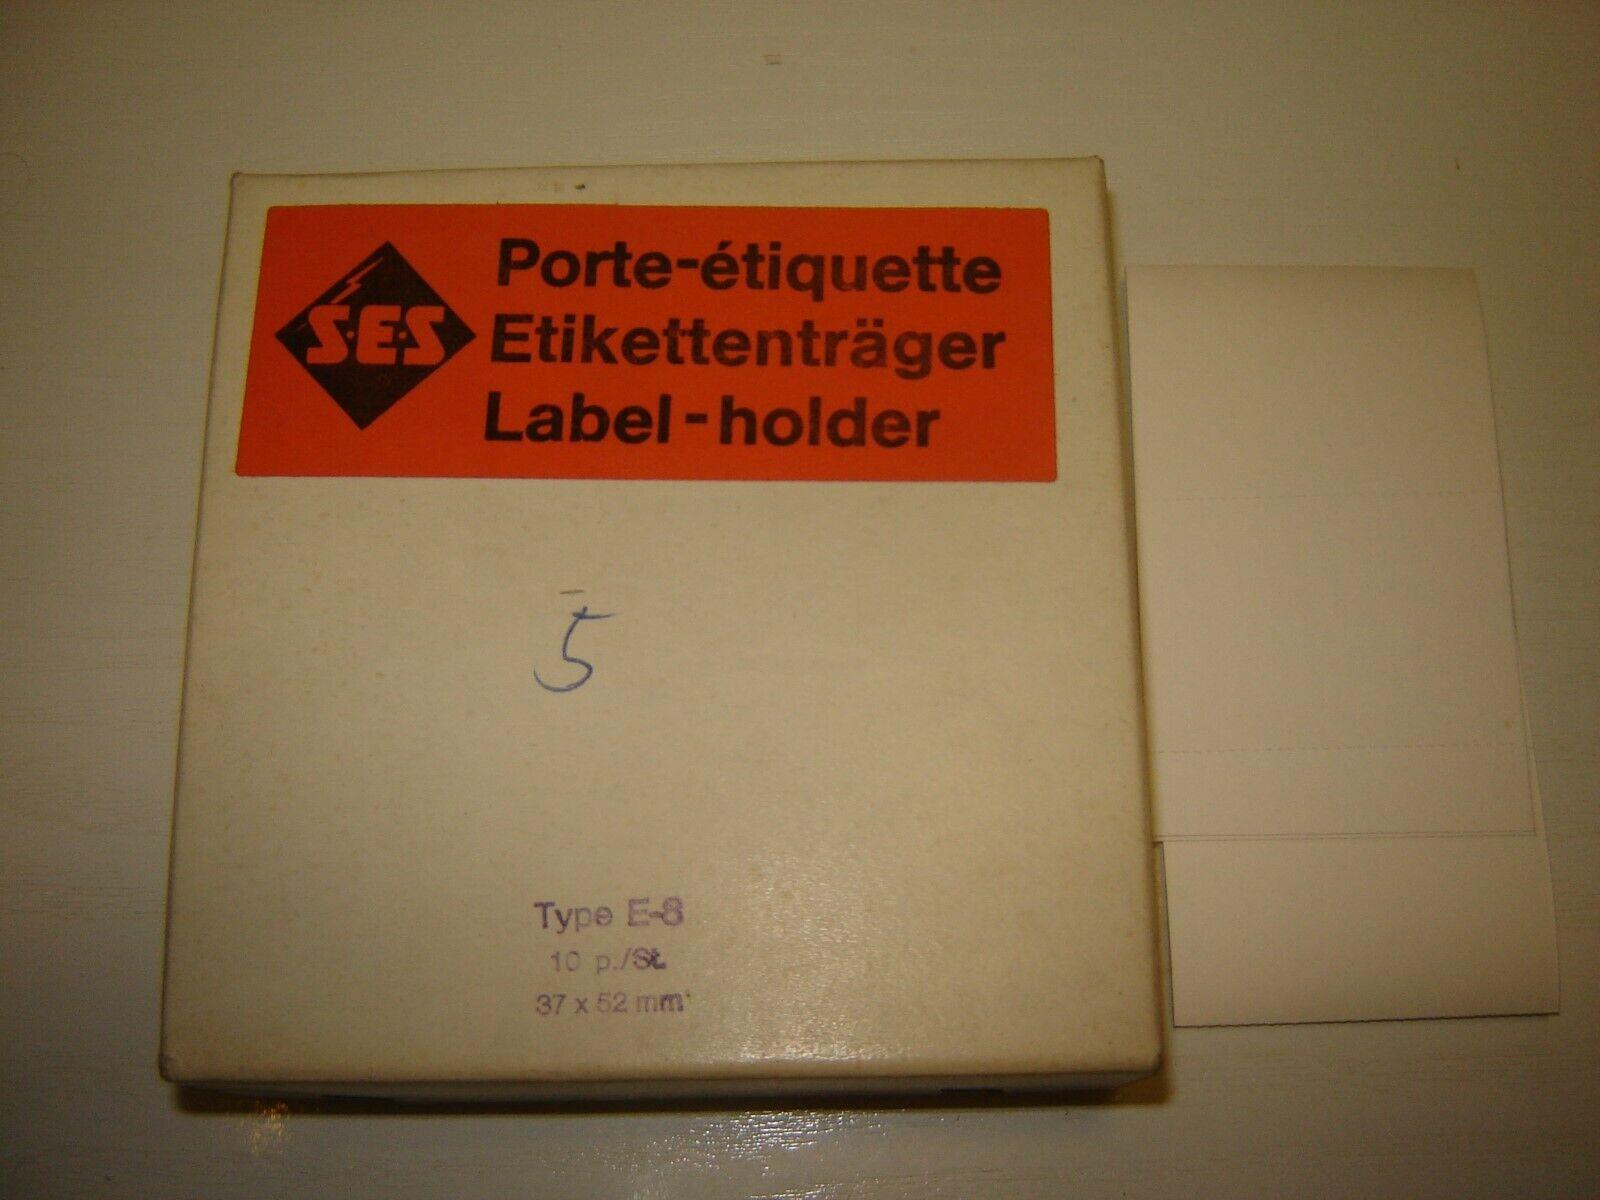 6 Etikettenträger SES  Kunststoff Typ E-8  37x52mm Neu